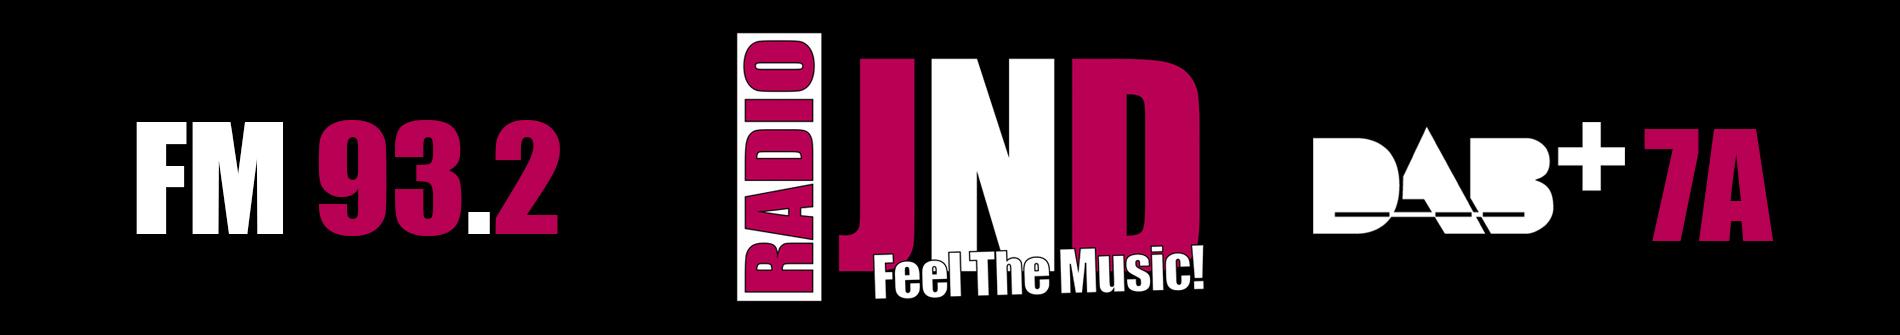 JND Radio